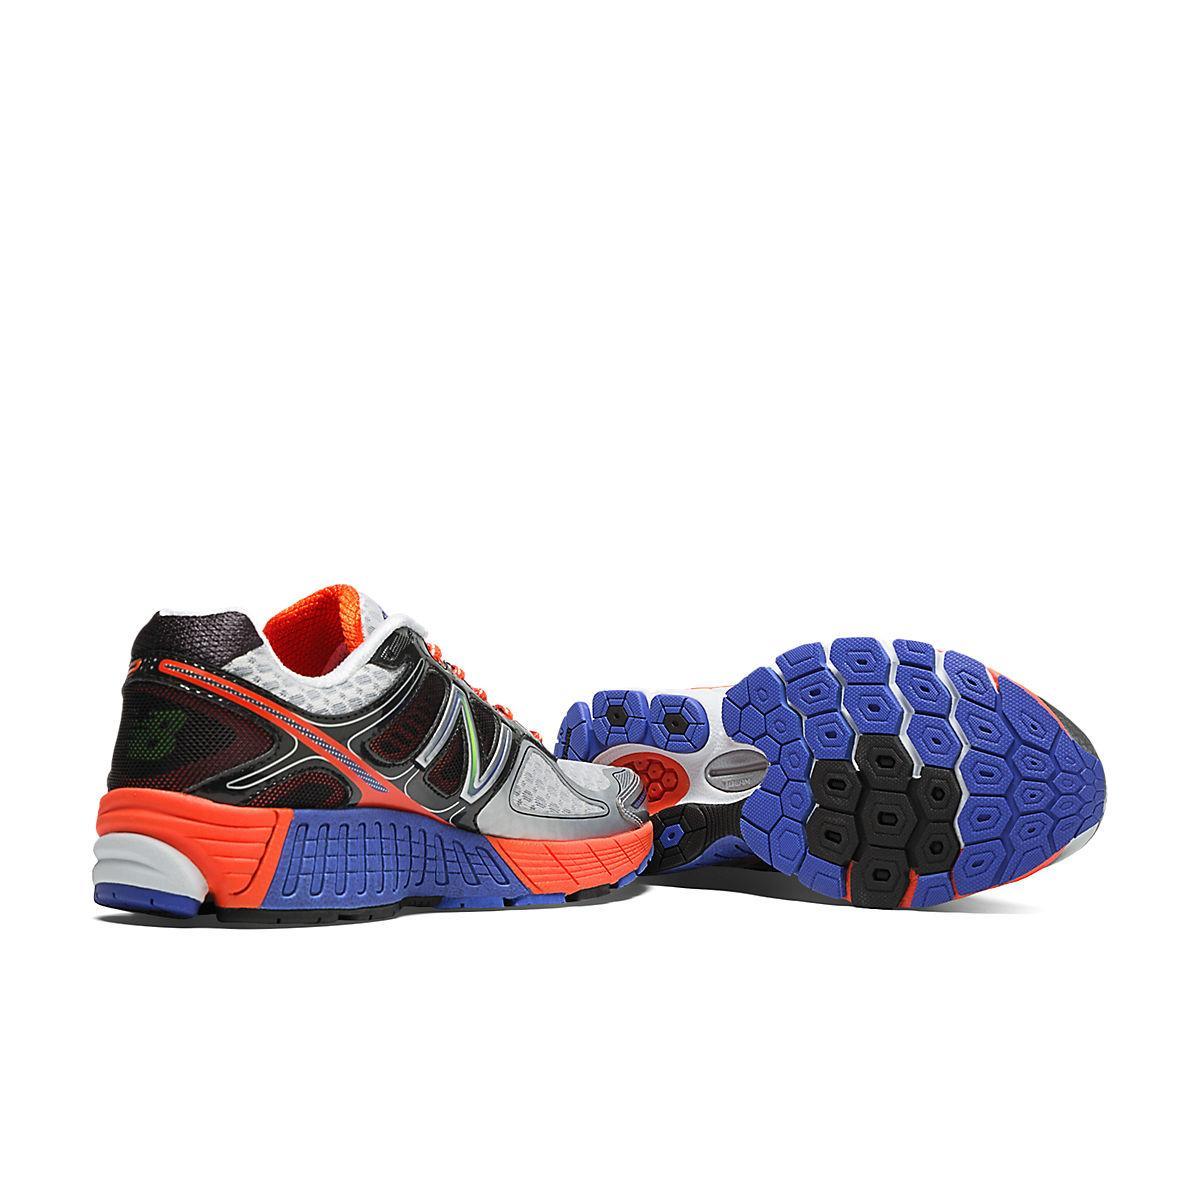 Best New Balance Cricket Shoes